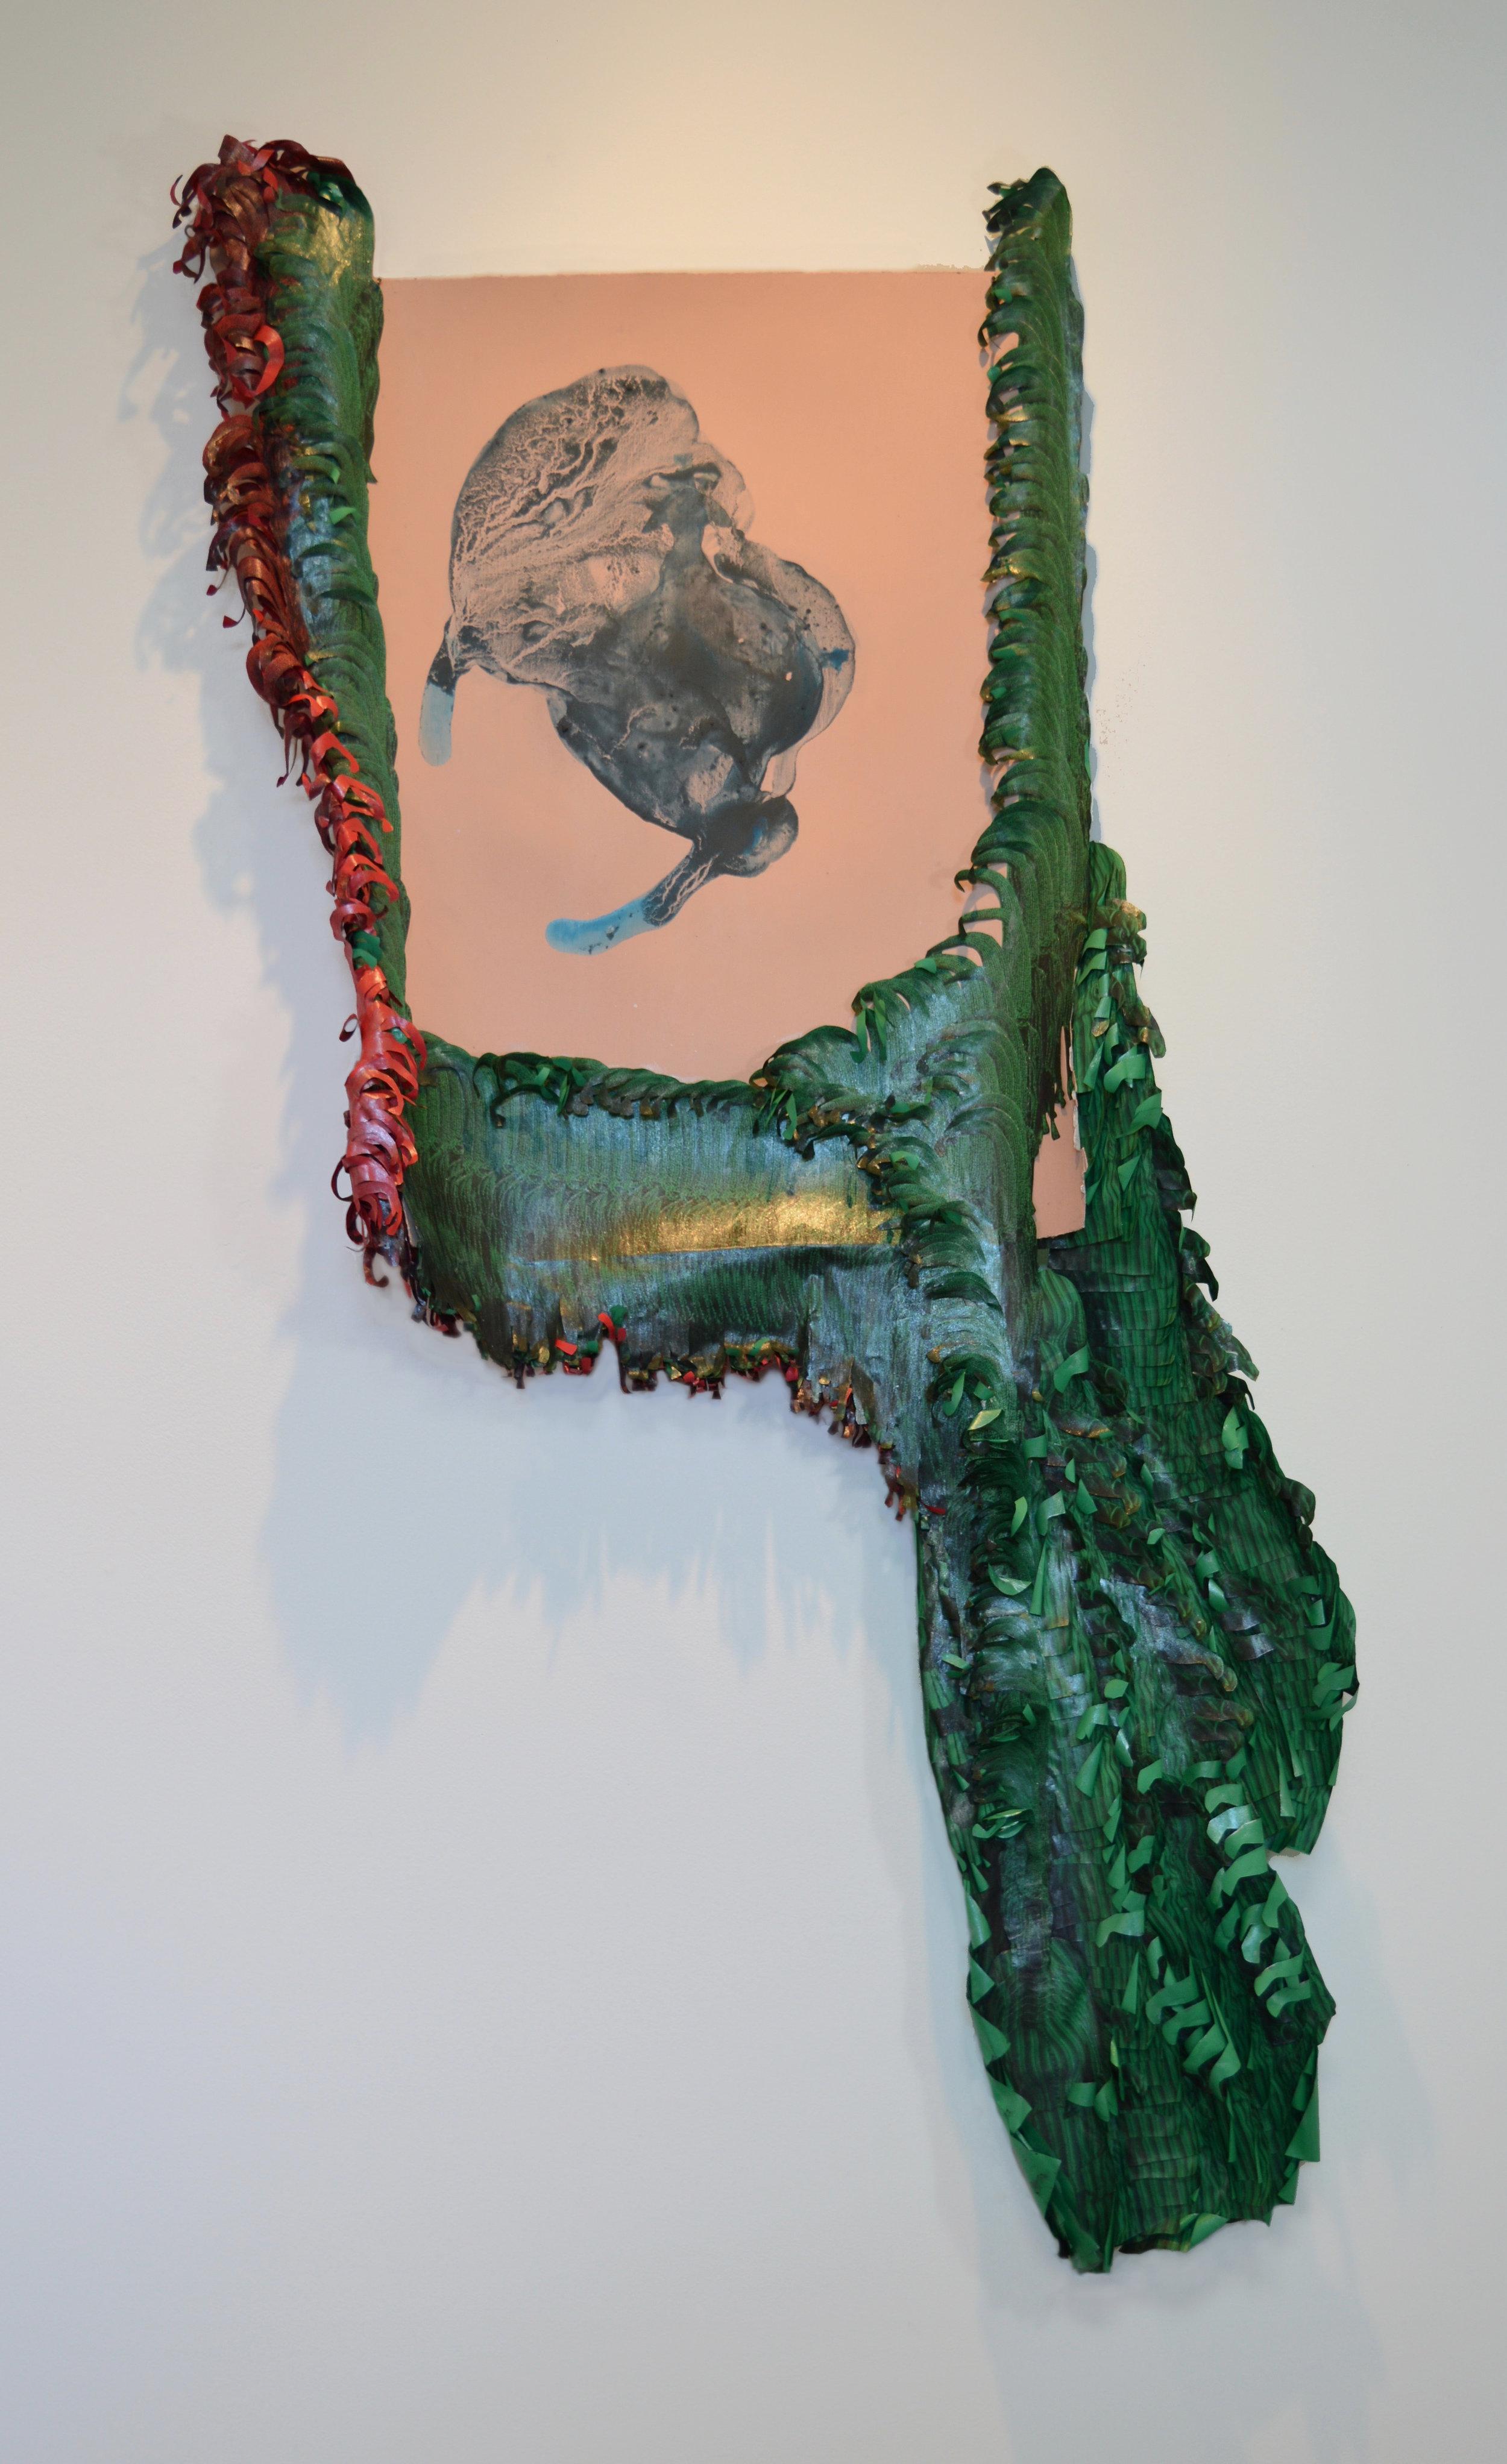 Yanique Norman   Quashie Silences: Jade Pinkgill Reverbs #2,  2019  Acrylic, gouache, matte medium, xerox, and collage on paper  64H x 36W inches